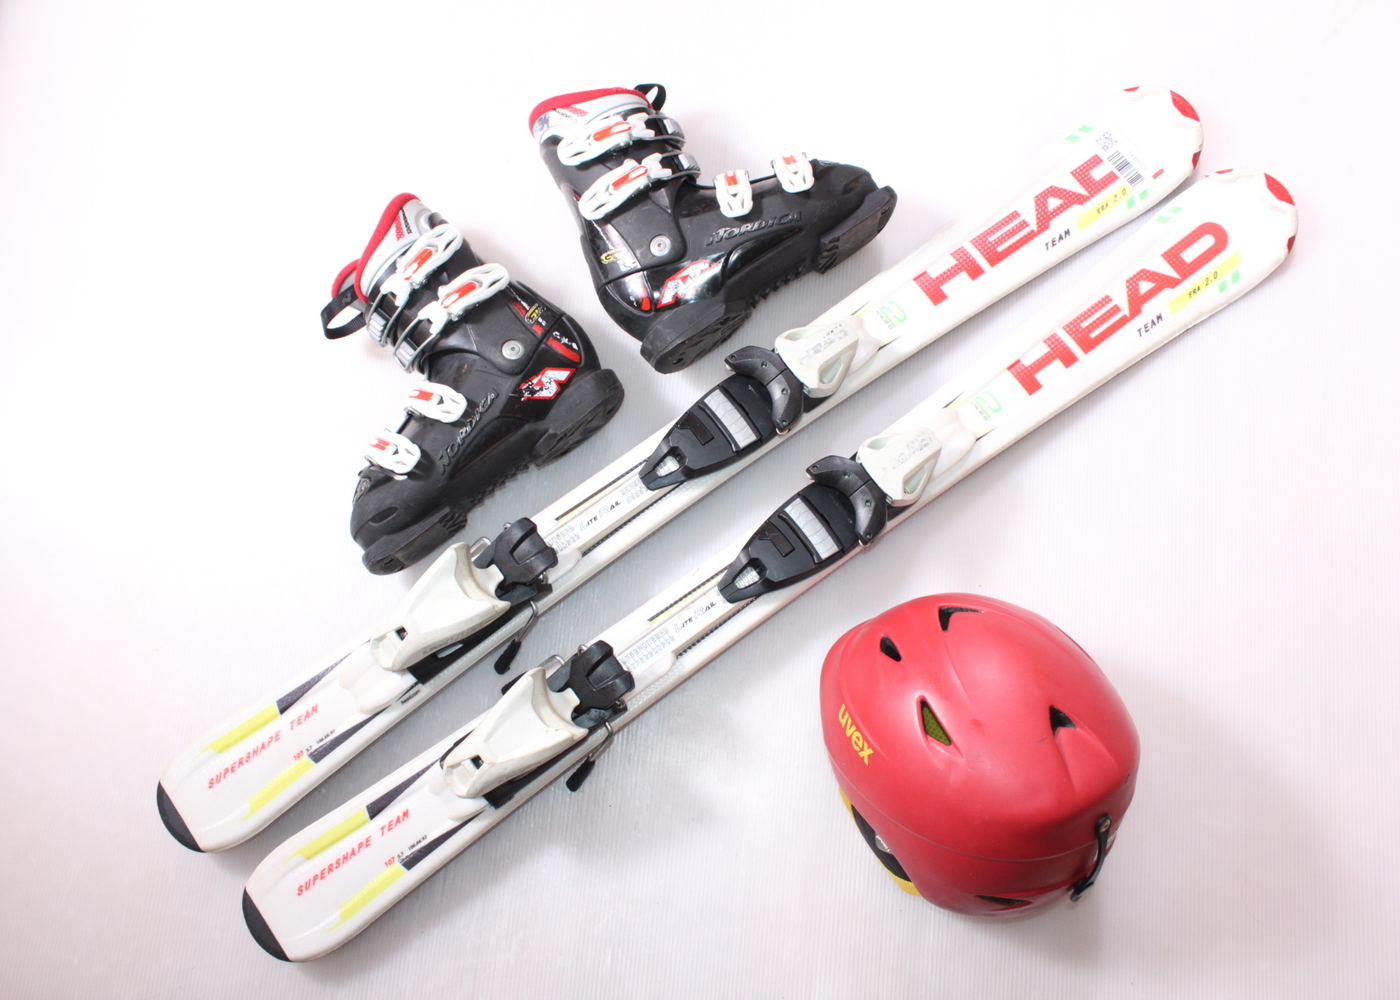 Dětské lyže HEAD SUPERSHAPE TEAM 107 cm + lyžáky  34EU + helma